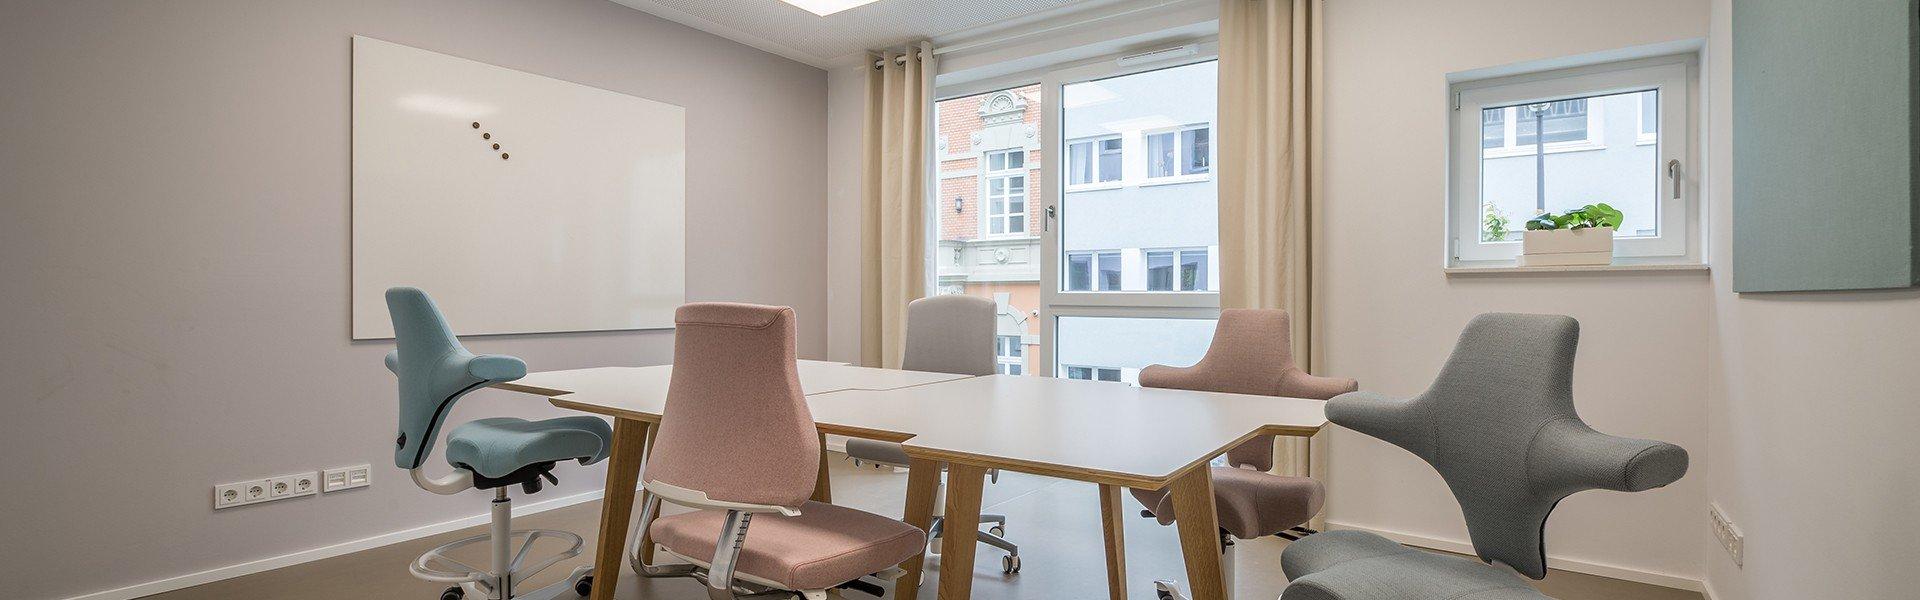 Köln conference rooms Meetingraum COWOKI Coworking plus image 0